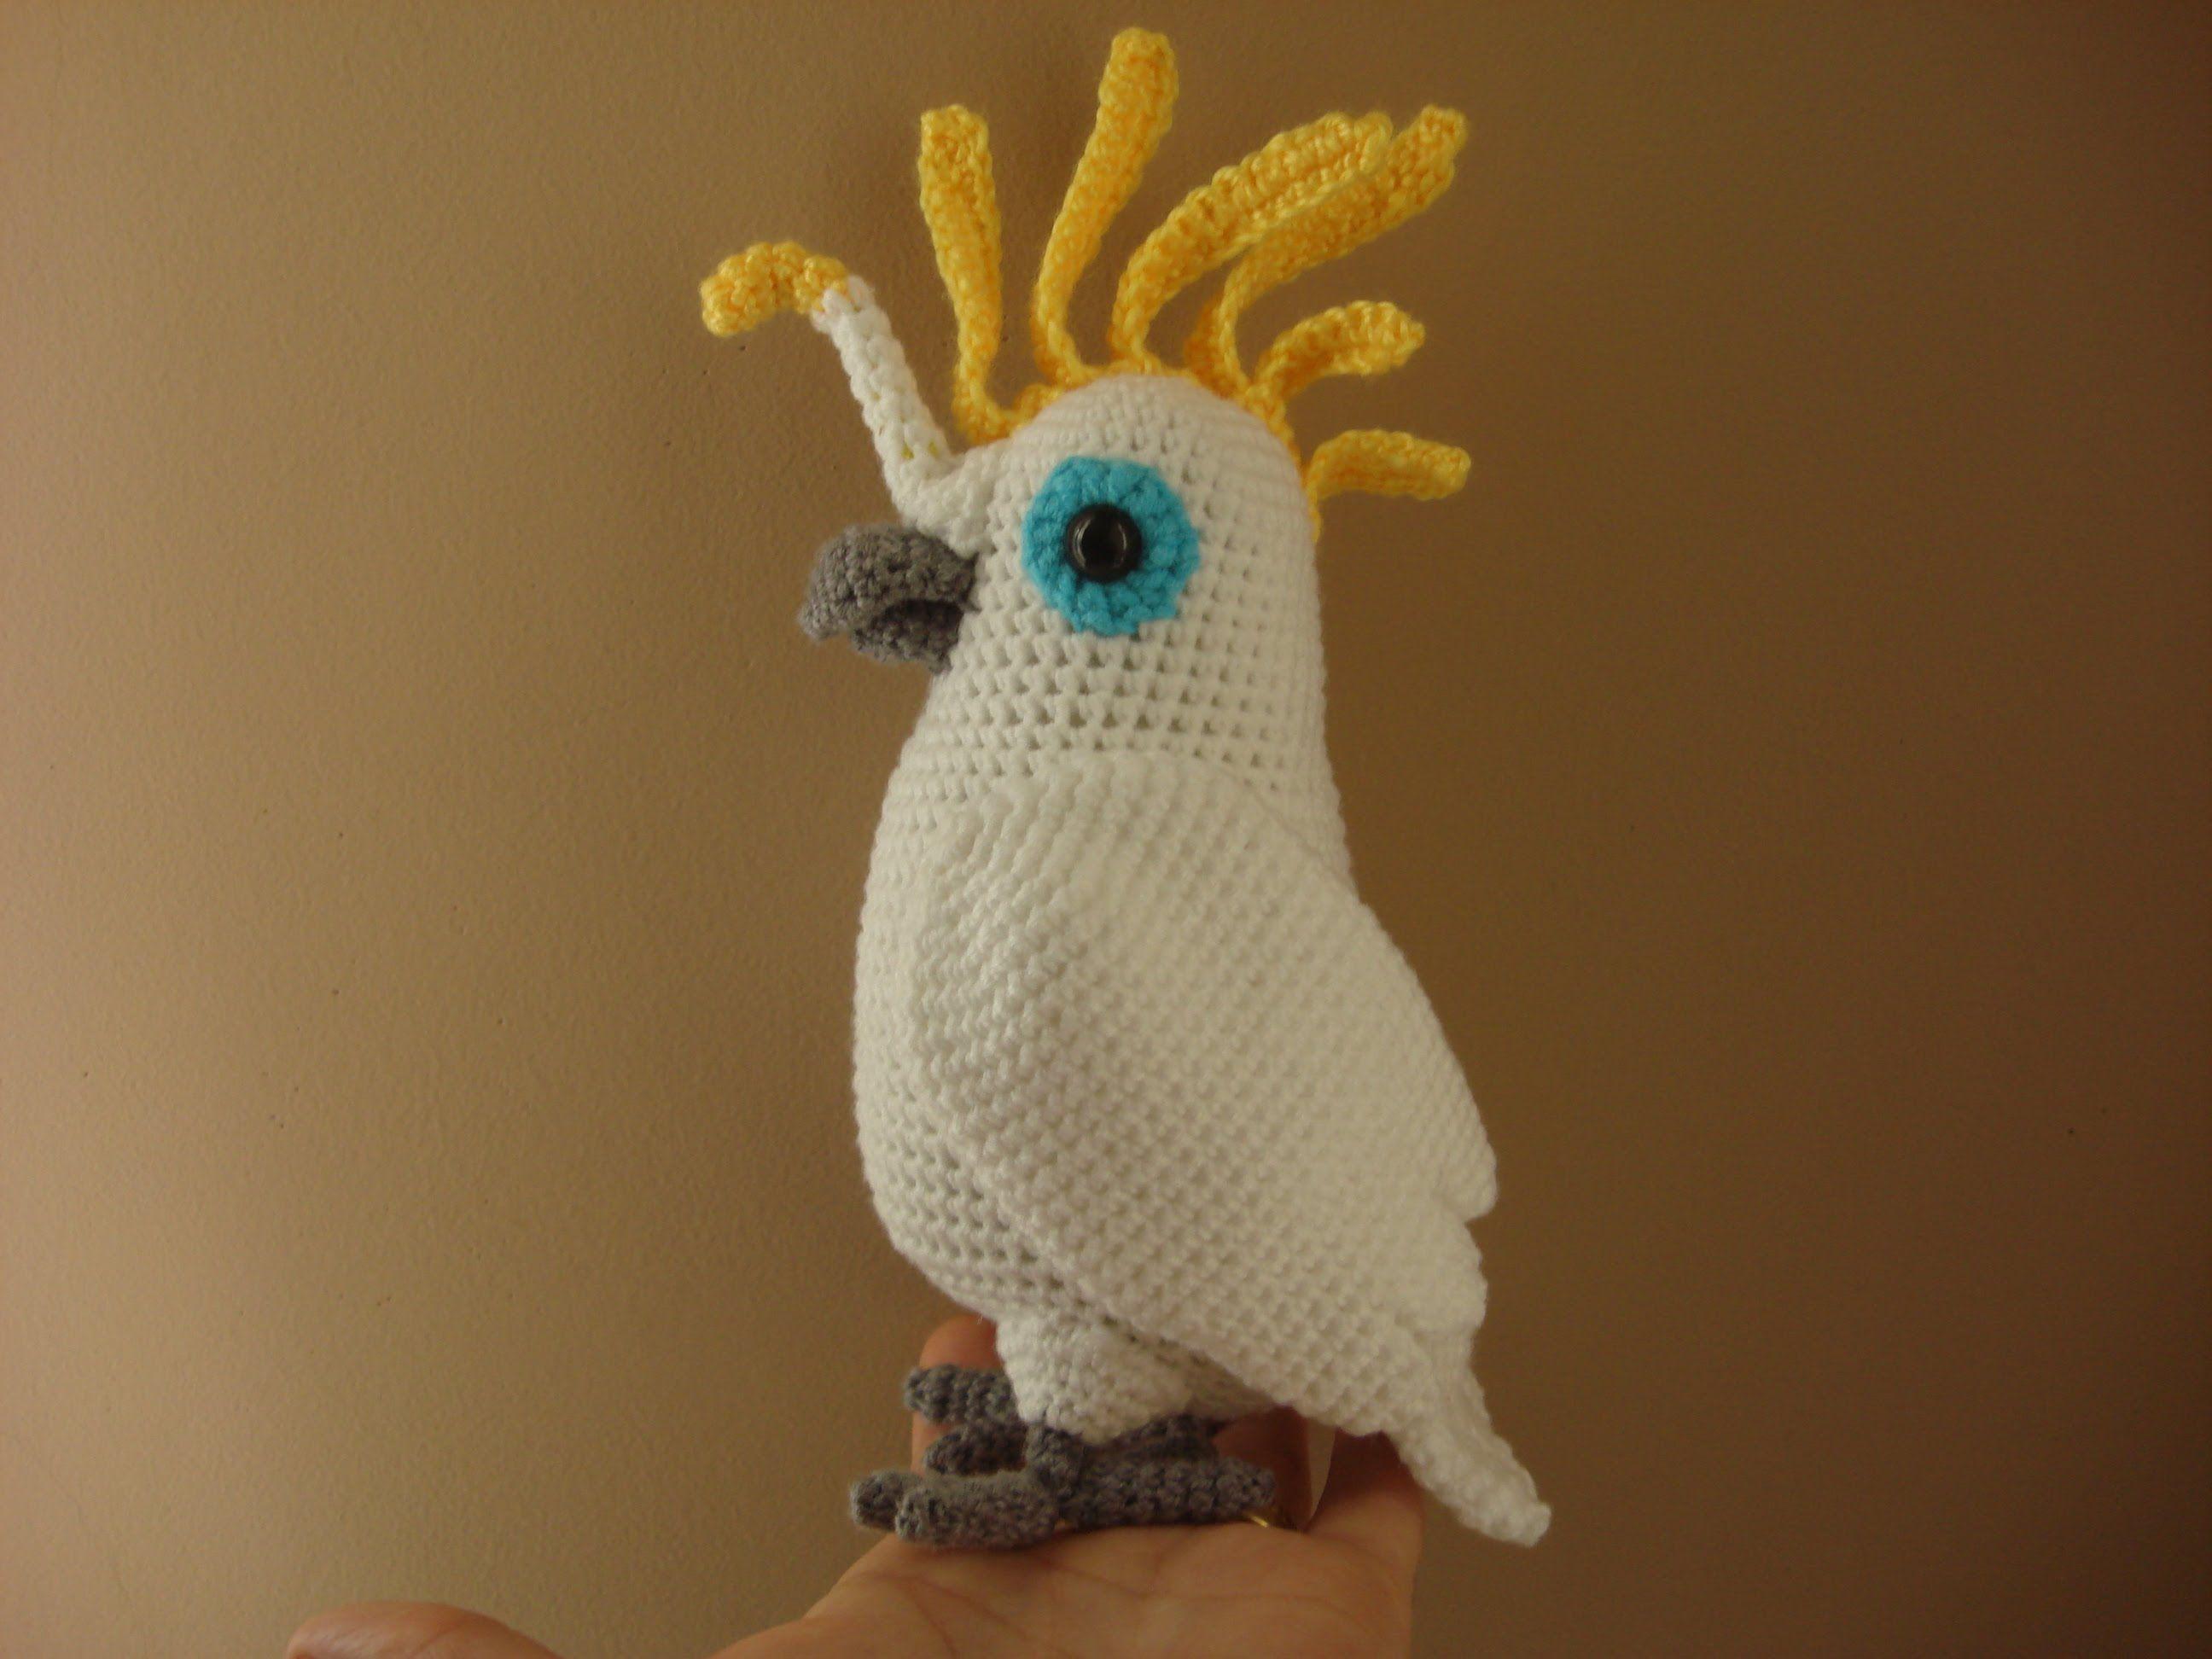 Amigurumi Bird Tutorial : Cacatua amigurumi tutorial игрушки amigurumi